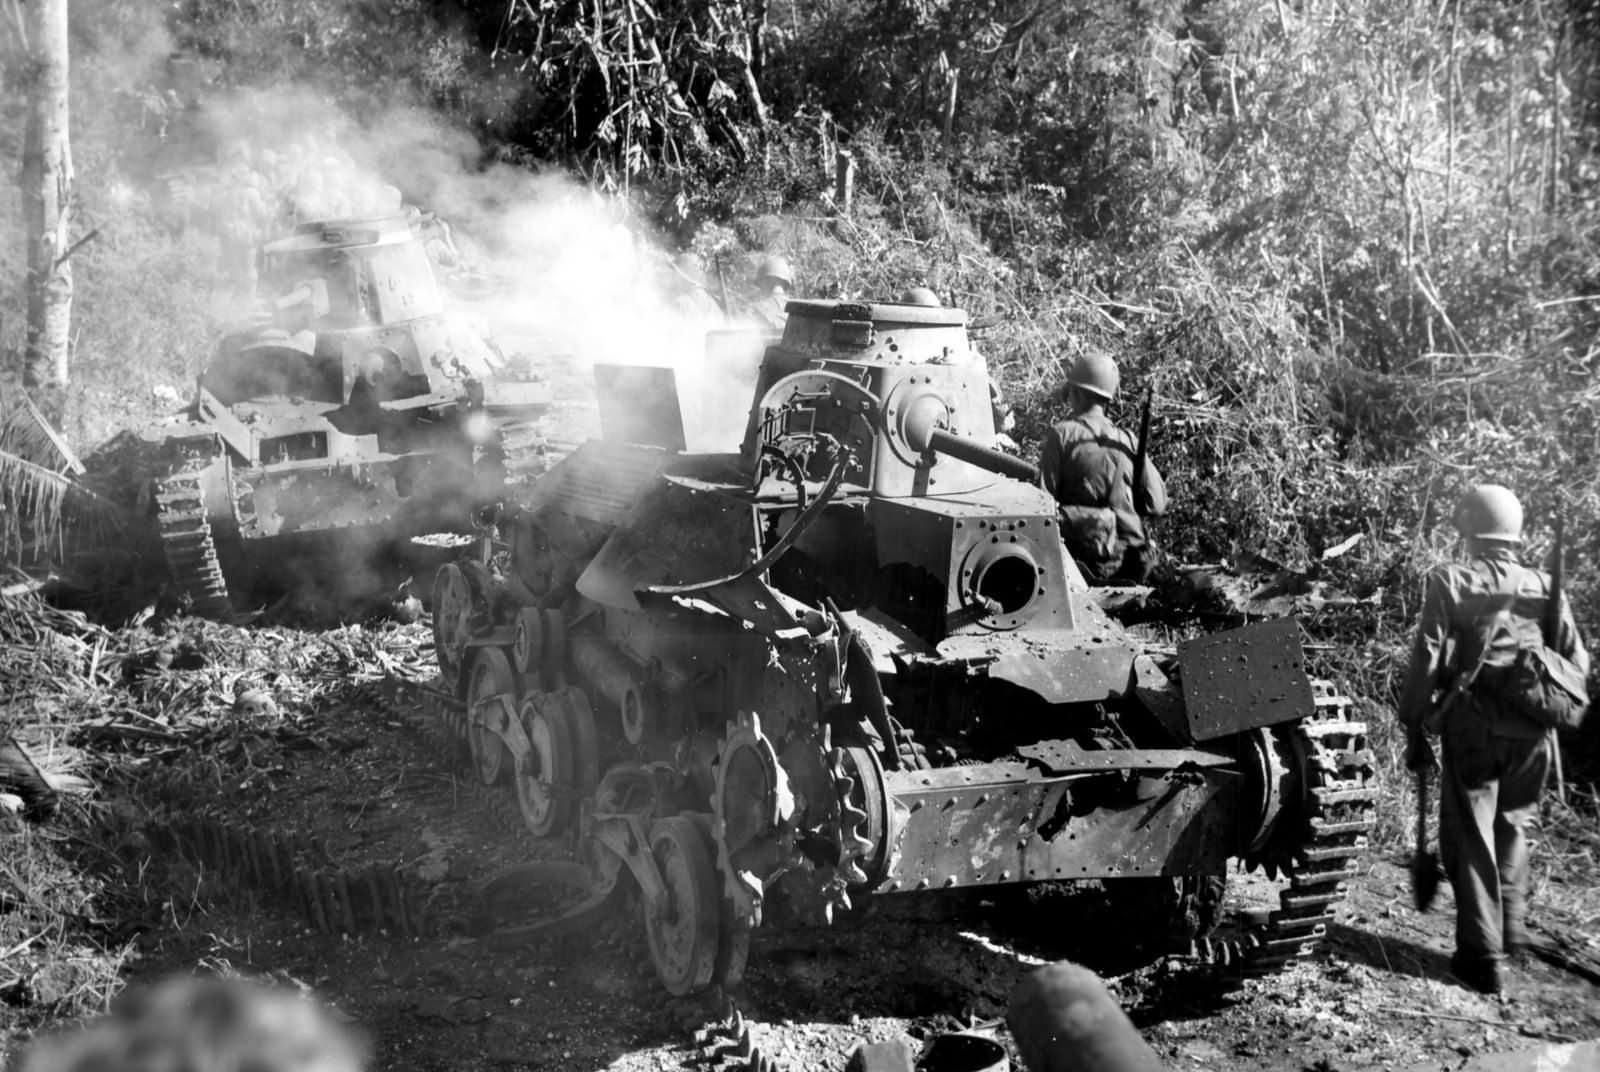 Type 95 Ha Go light tanks burning on Guam 1944